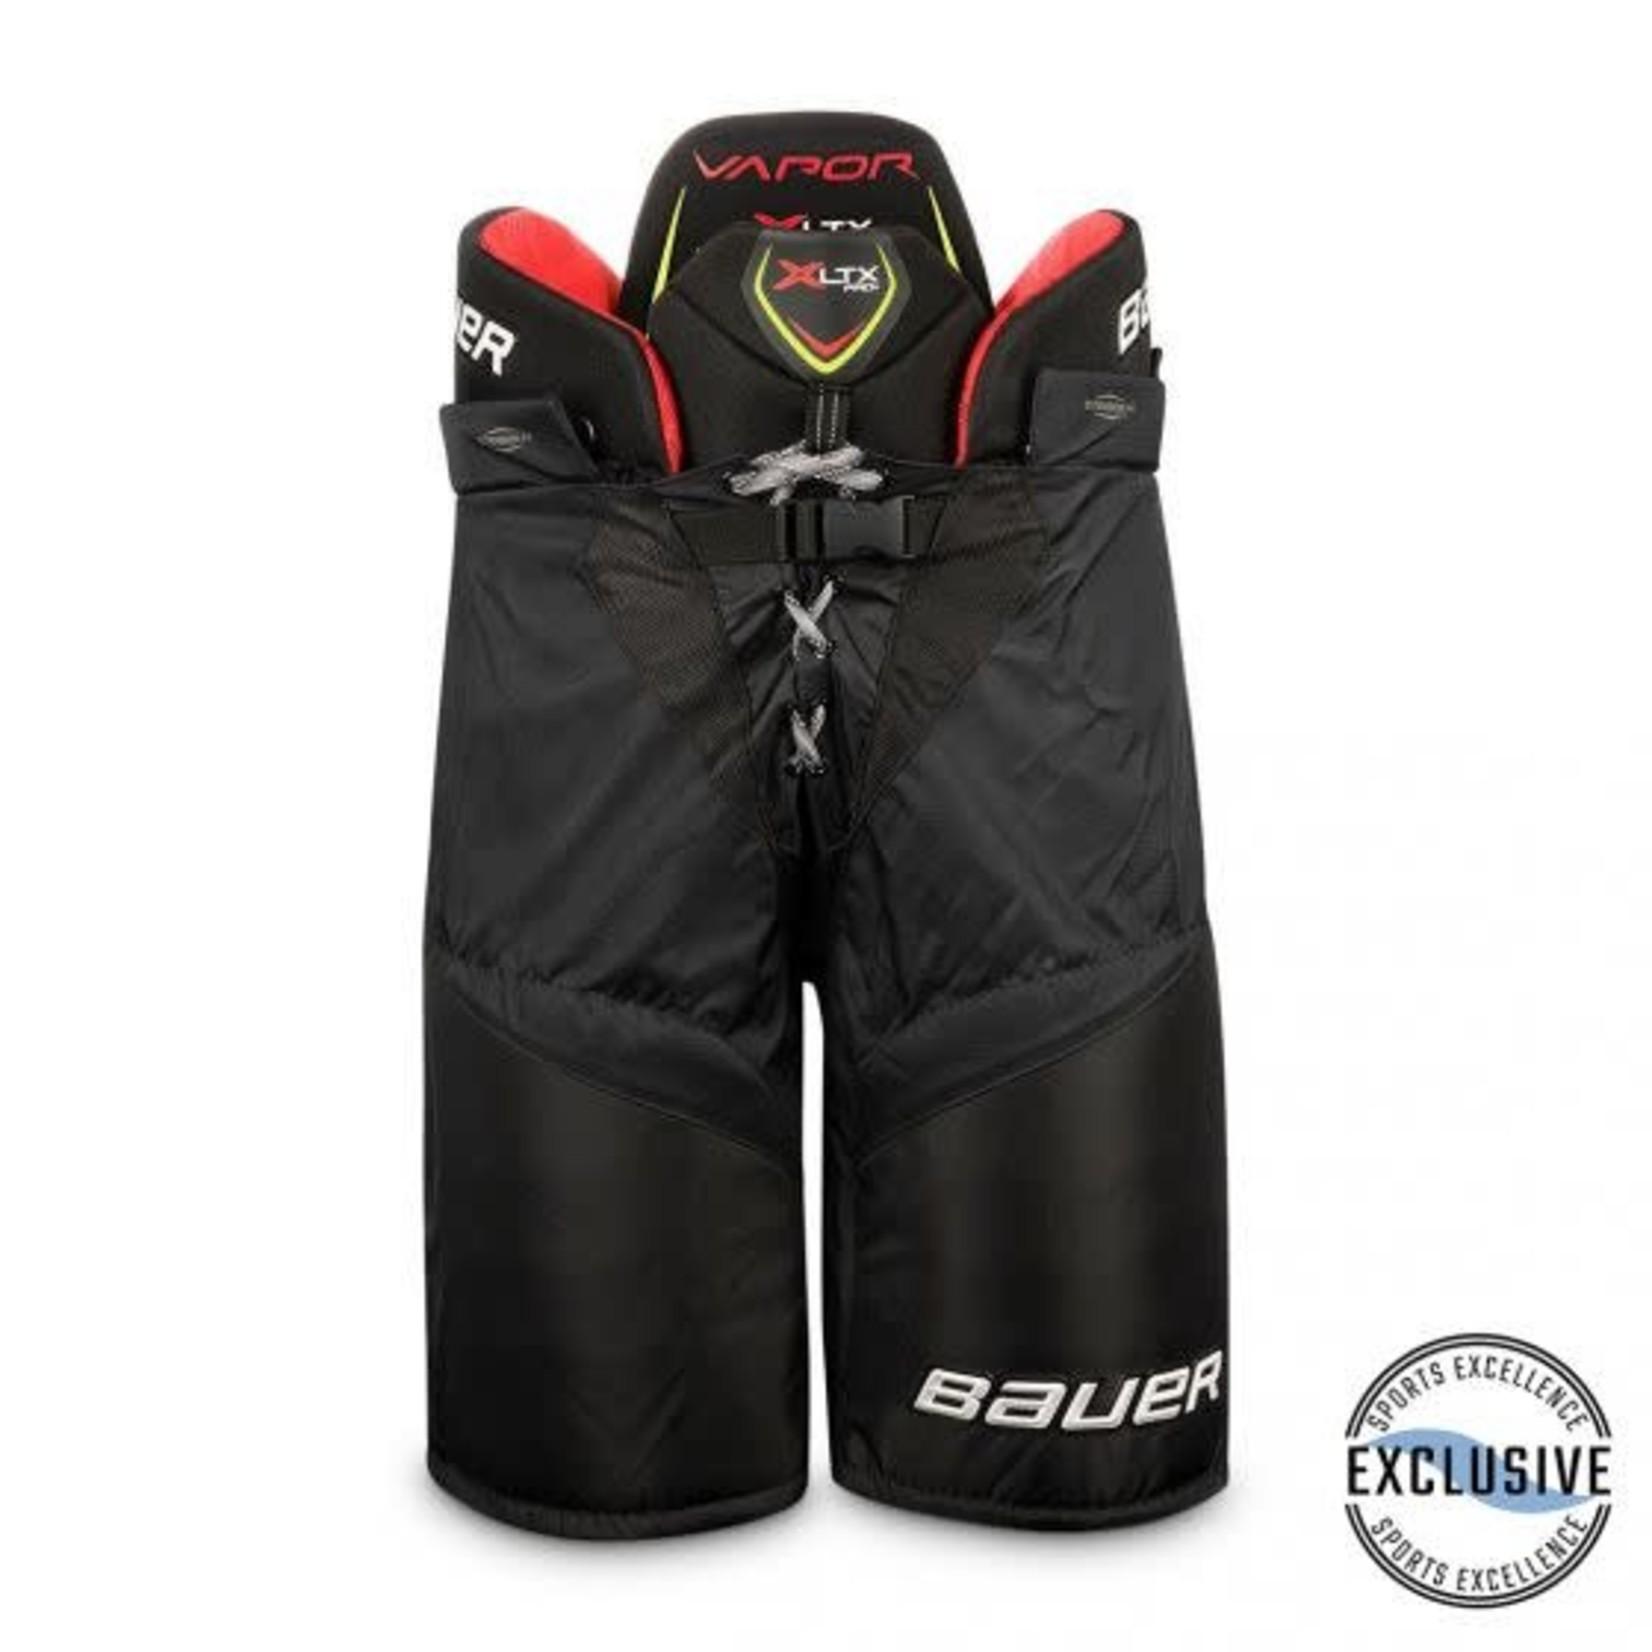 Bauer Bauer Hockey Pants, Vapor XLTX Pro+, Senior